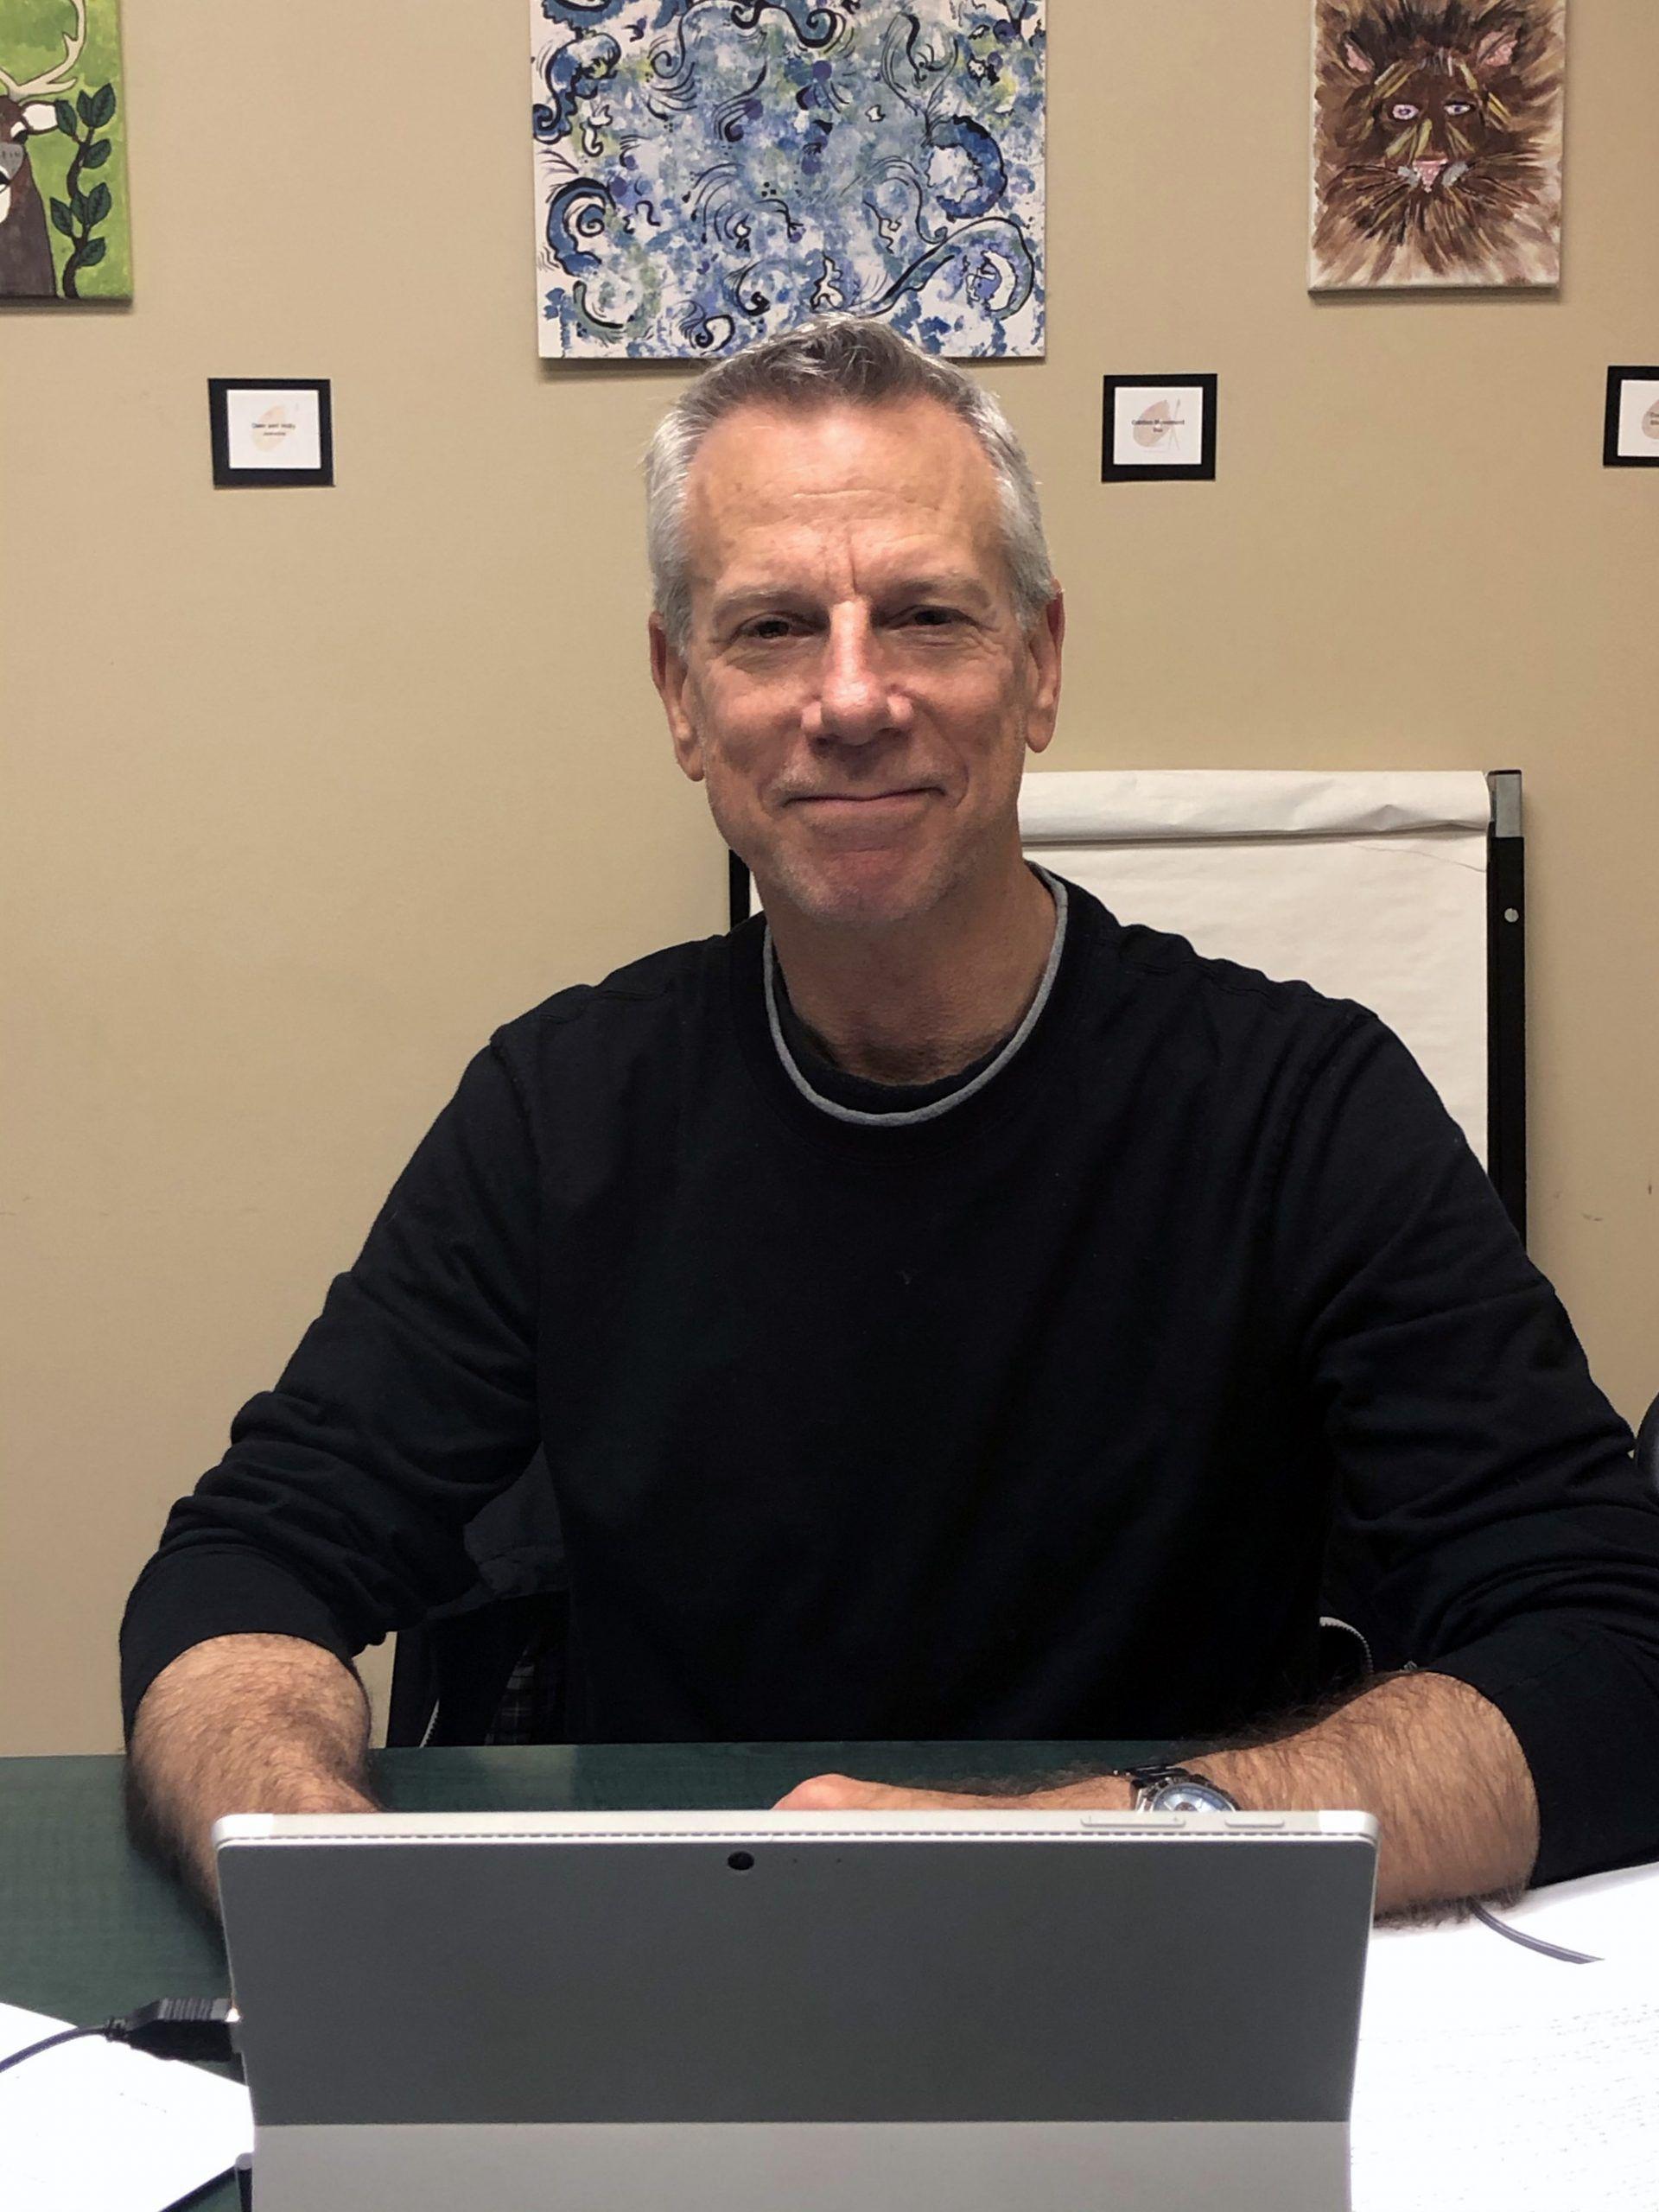 Shown here is Mike Benin, Executive Director CMHA Brant Haldimand Norfolk Branch